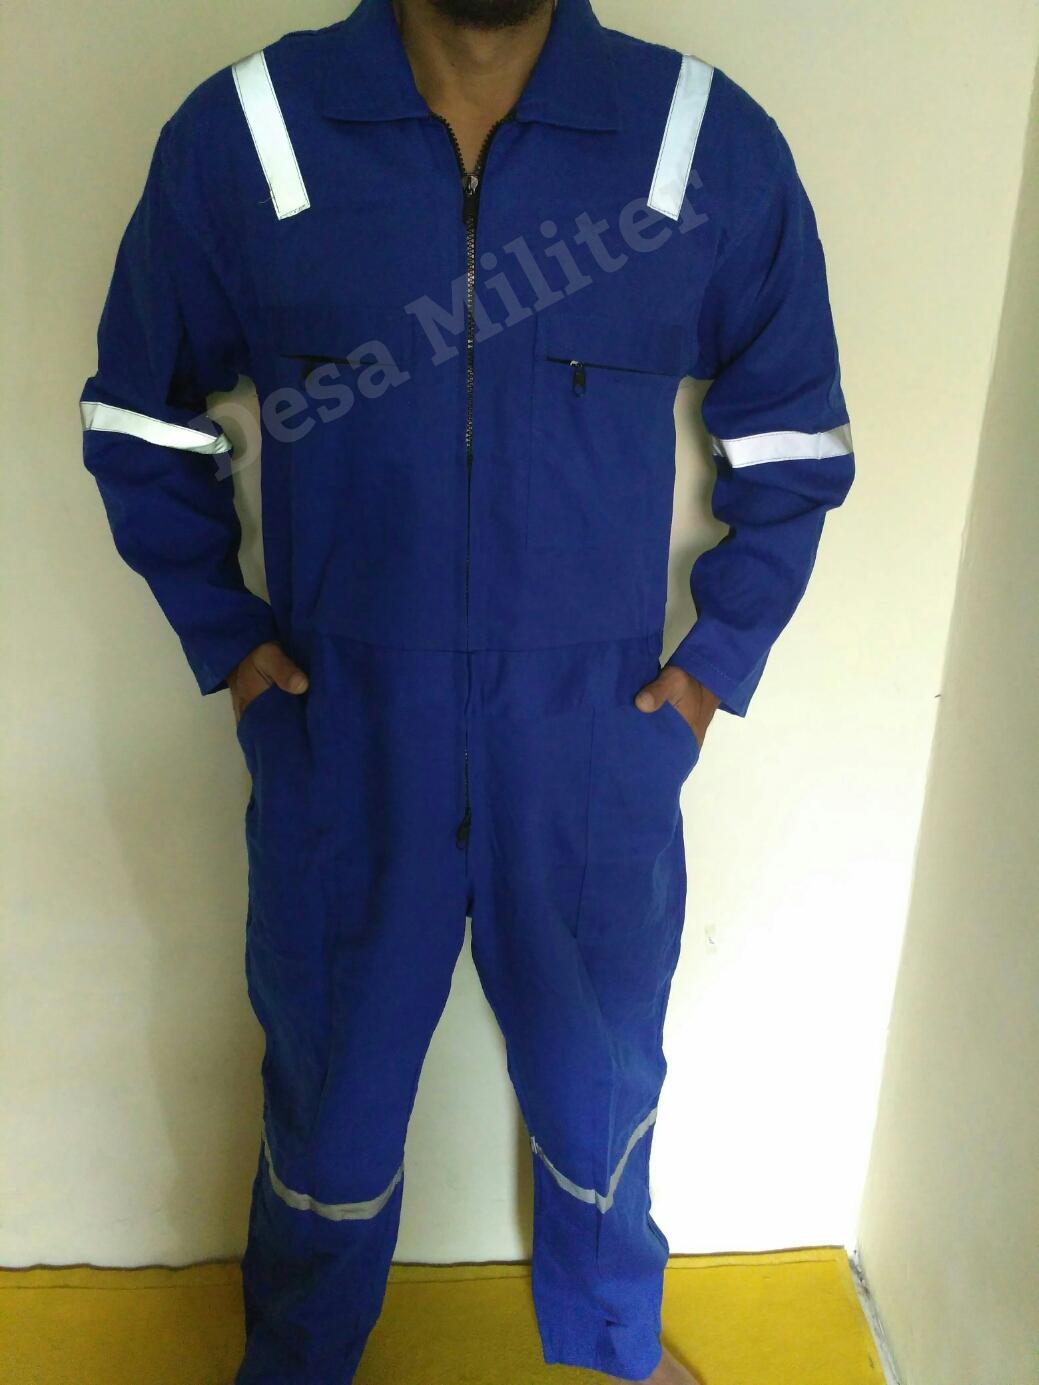 Wearpack Biru Scoutlight - Katelpak - Overall - Seragam Safety - Seragam Bengkel - Kemeja Proyek